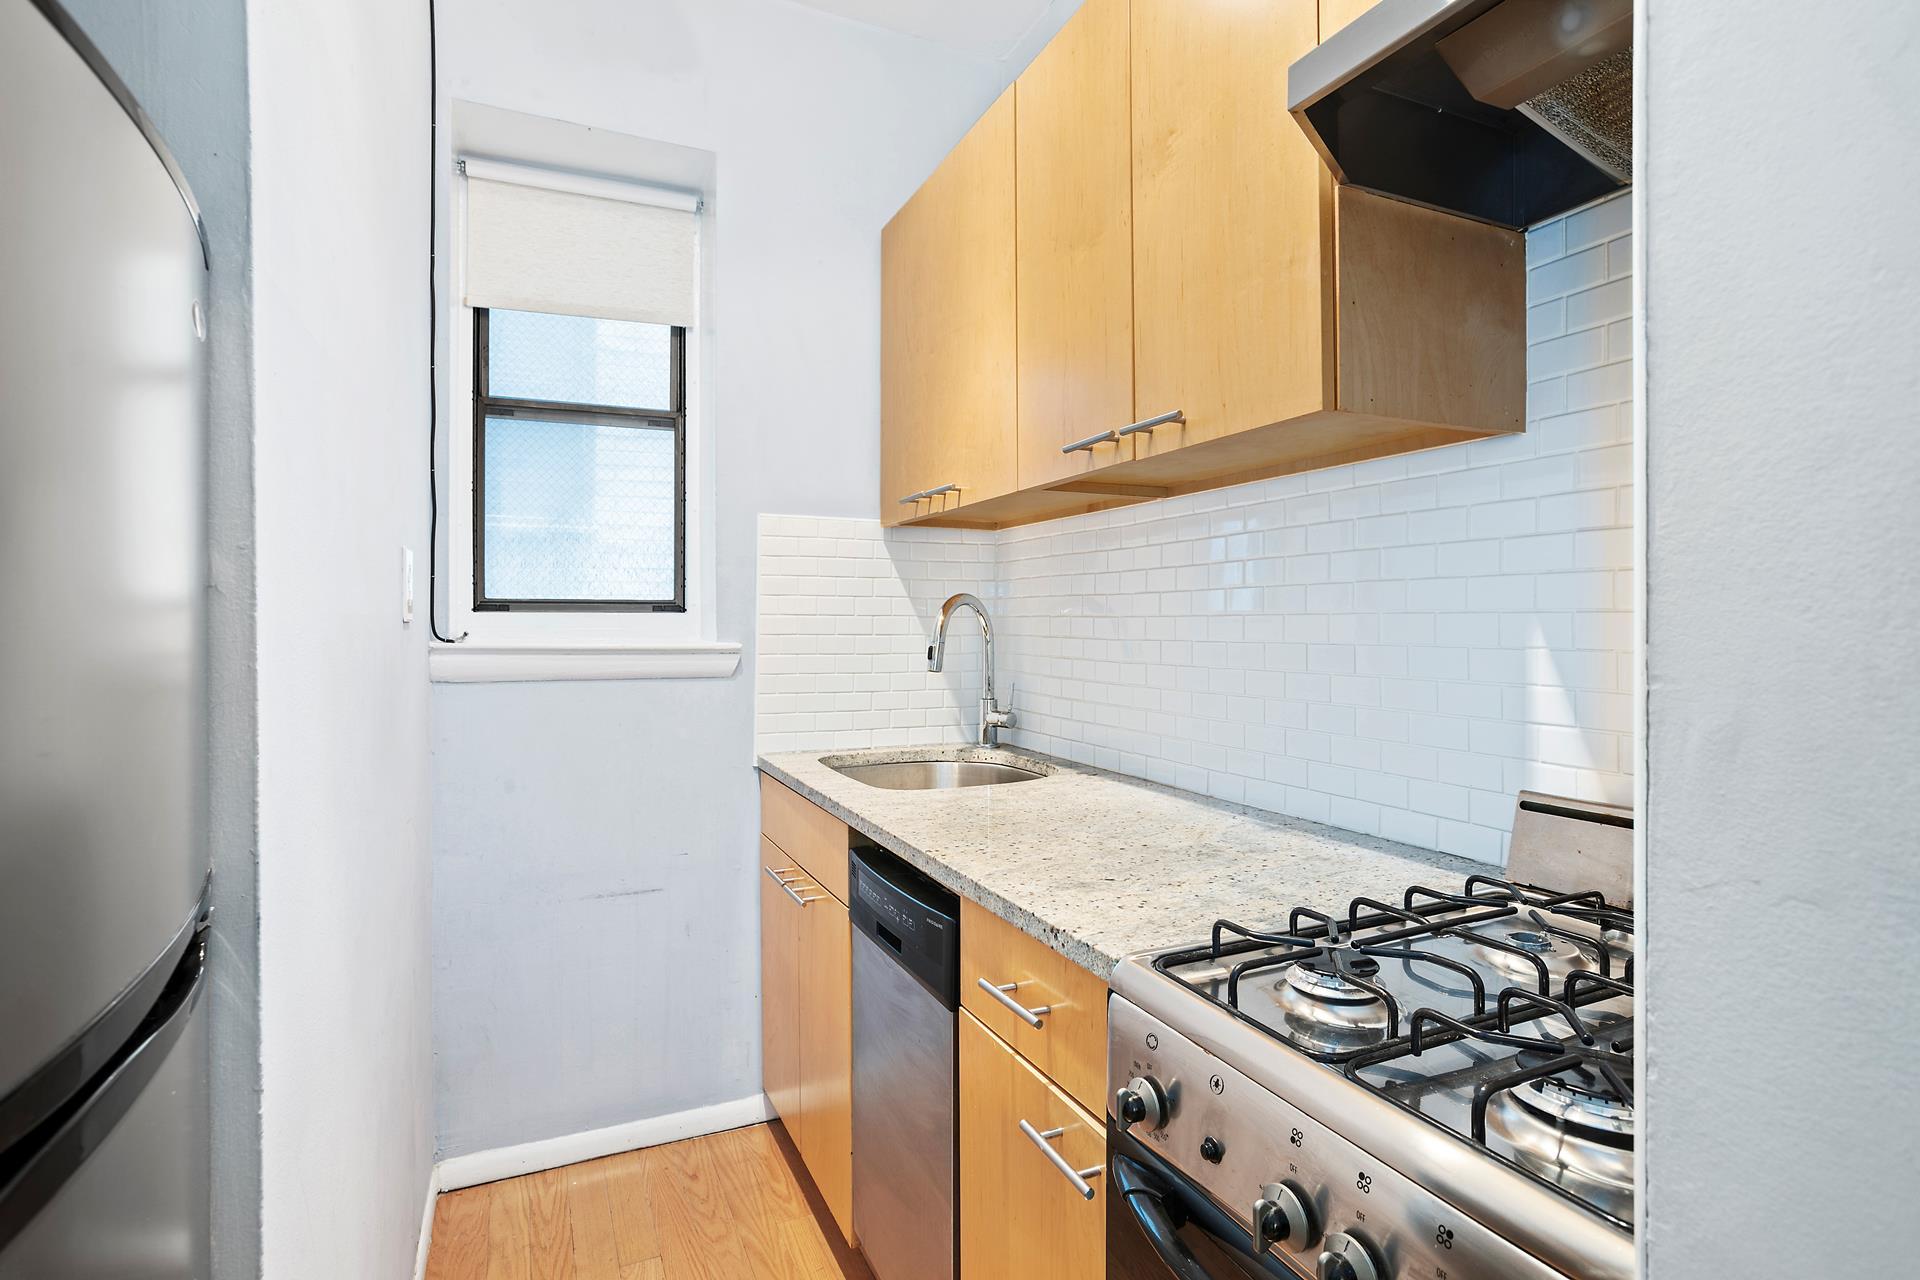 207 East 21st Street Gramercy Park New York NY 10010